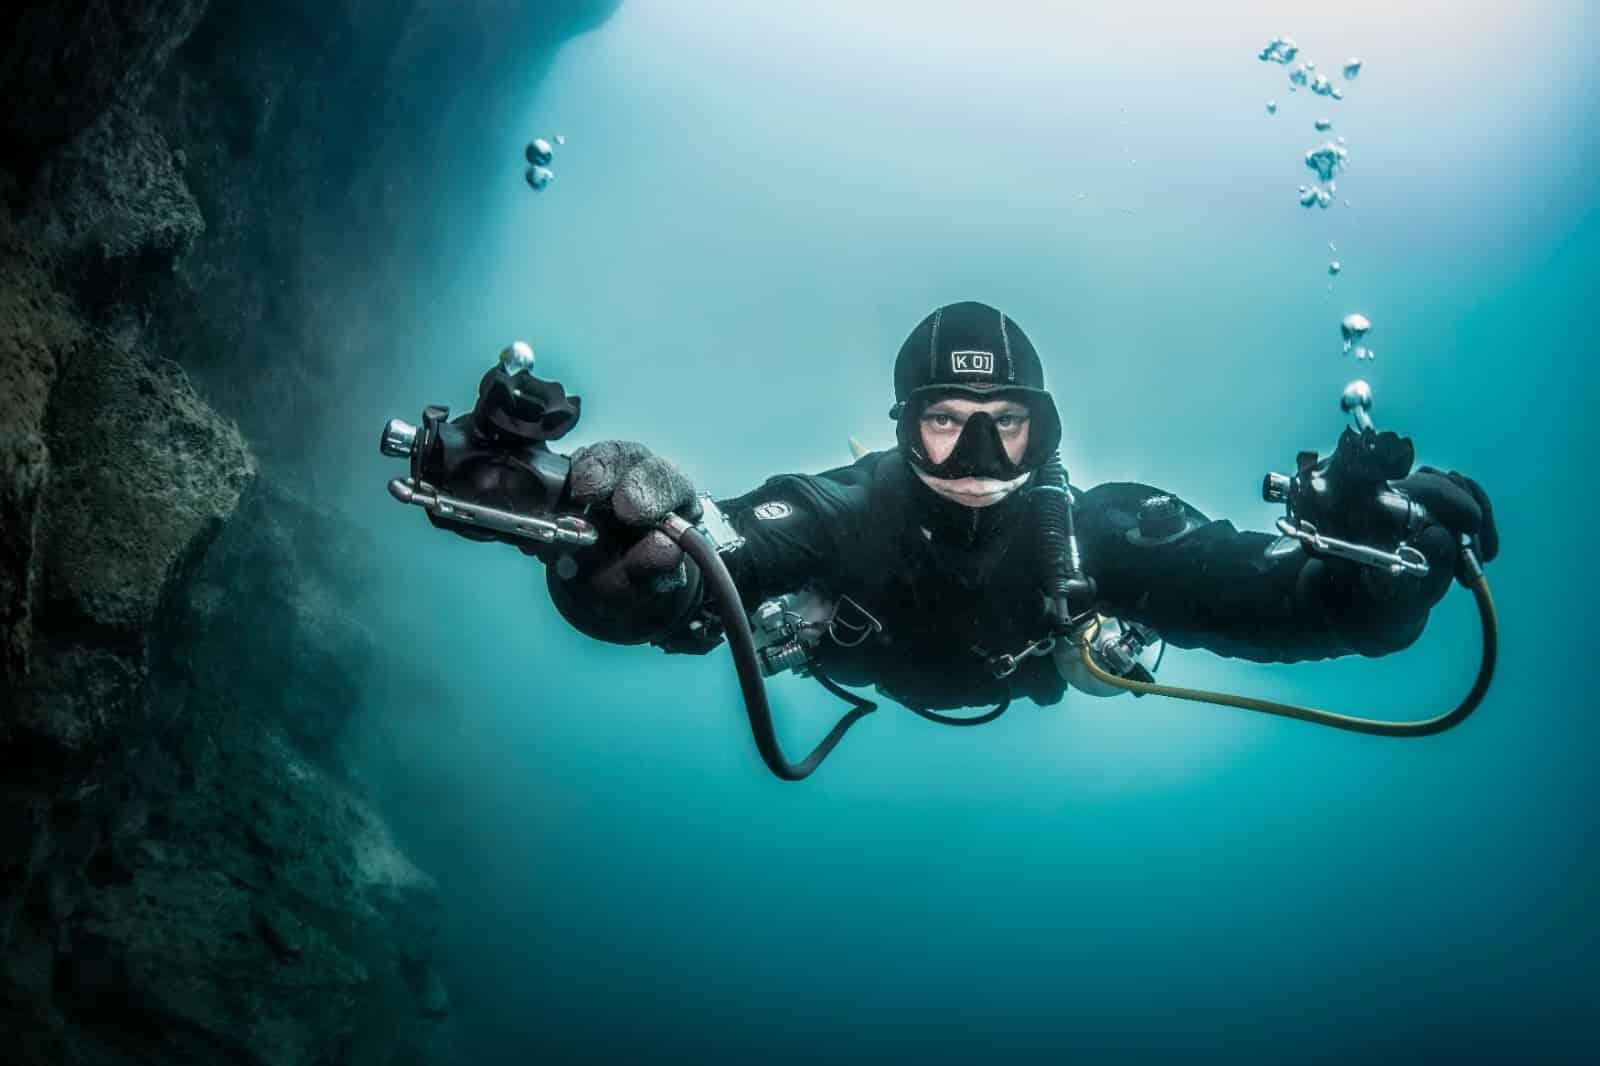 Nurkowanie demo days Koparki 2020 divers24.pl